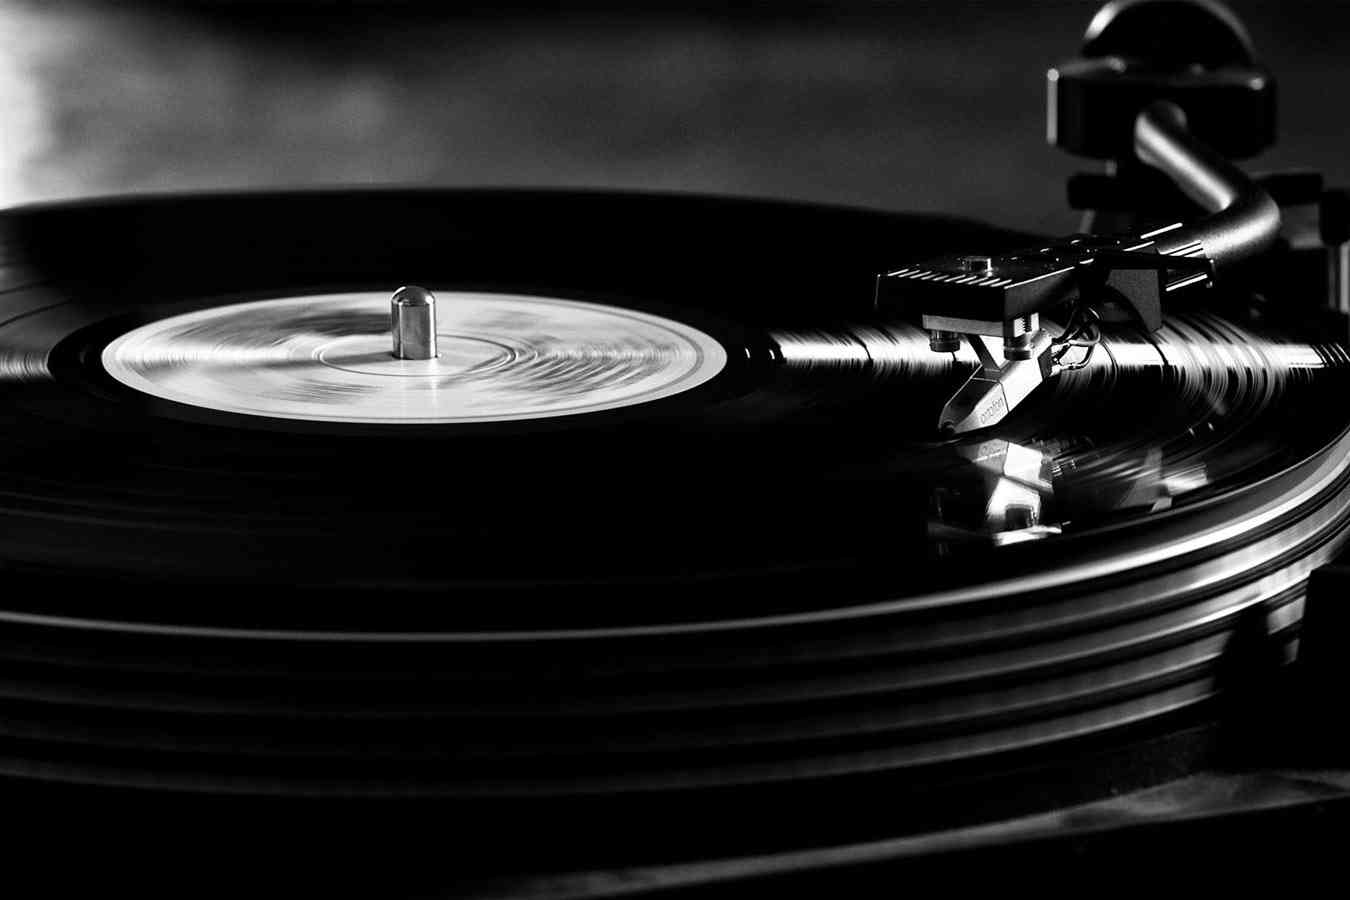 17 settembre nel rock: 33 giri, Doors, Who, Pink Floyd, Guns N' Roses, ZZ Top, Keith Flint